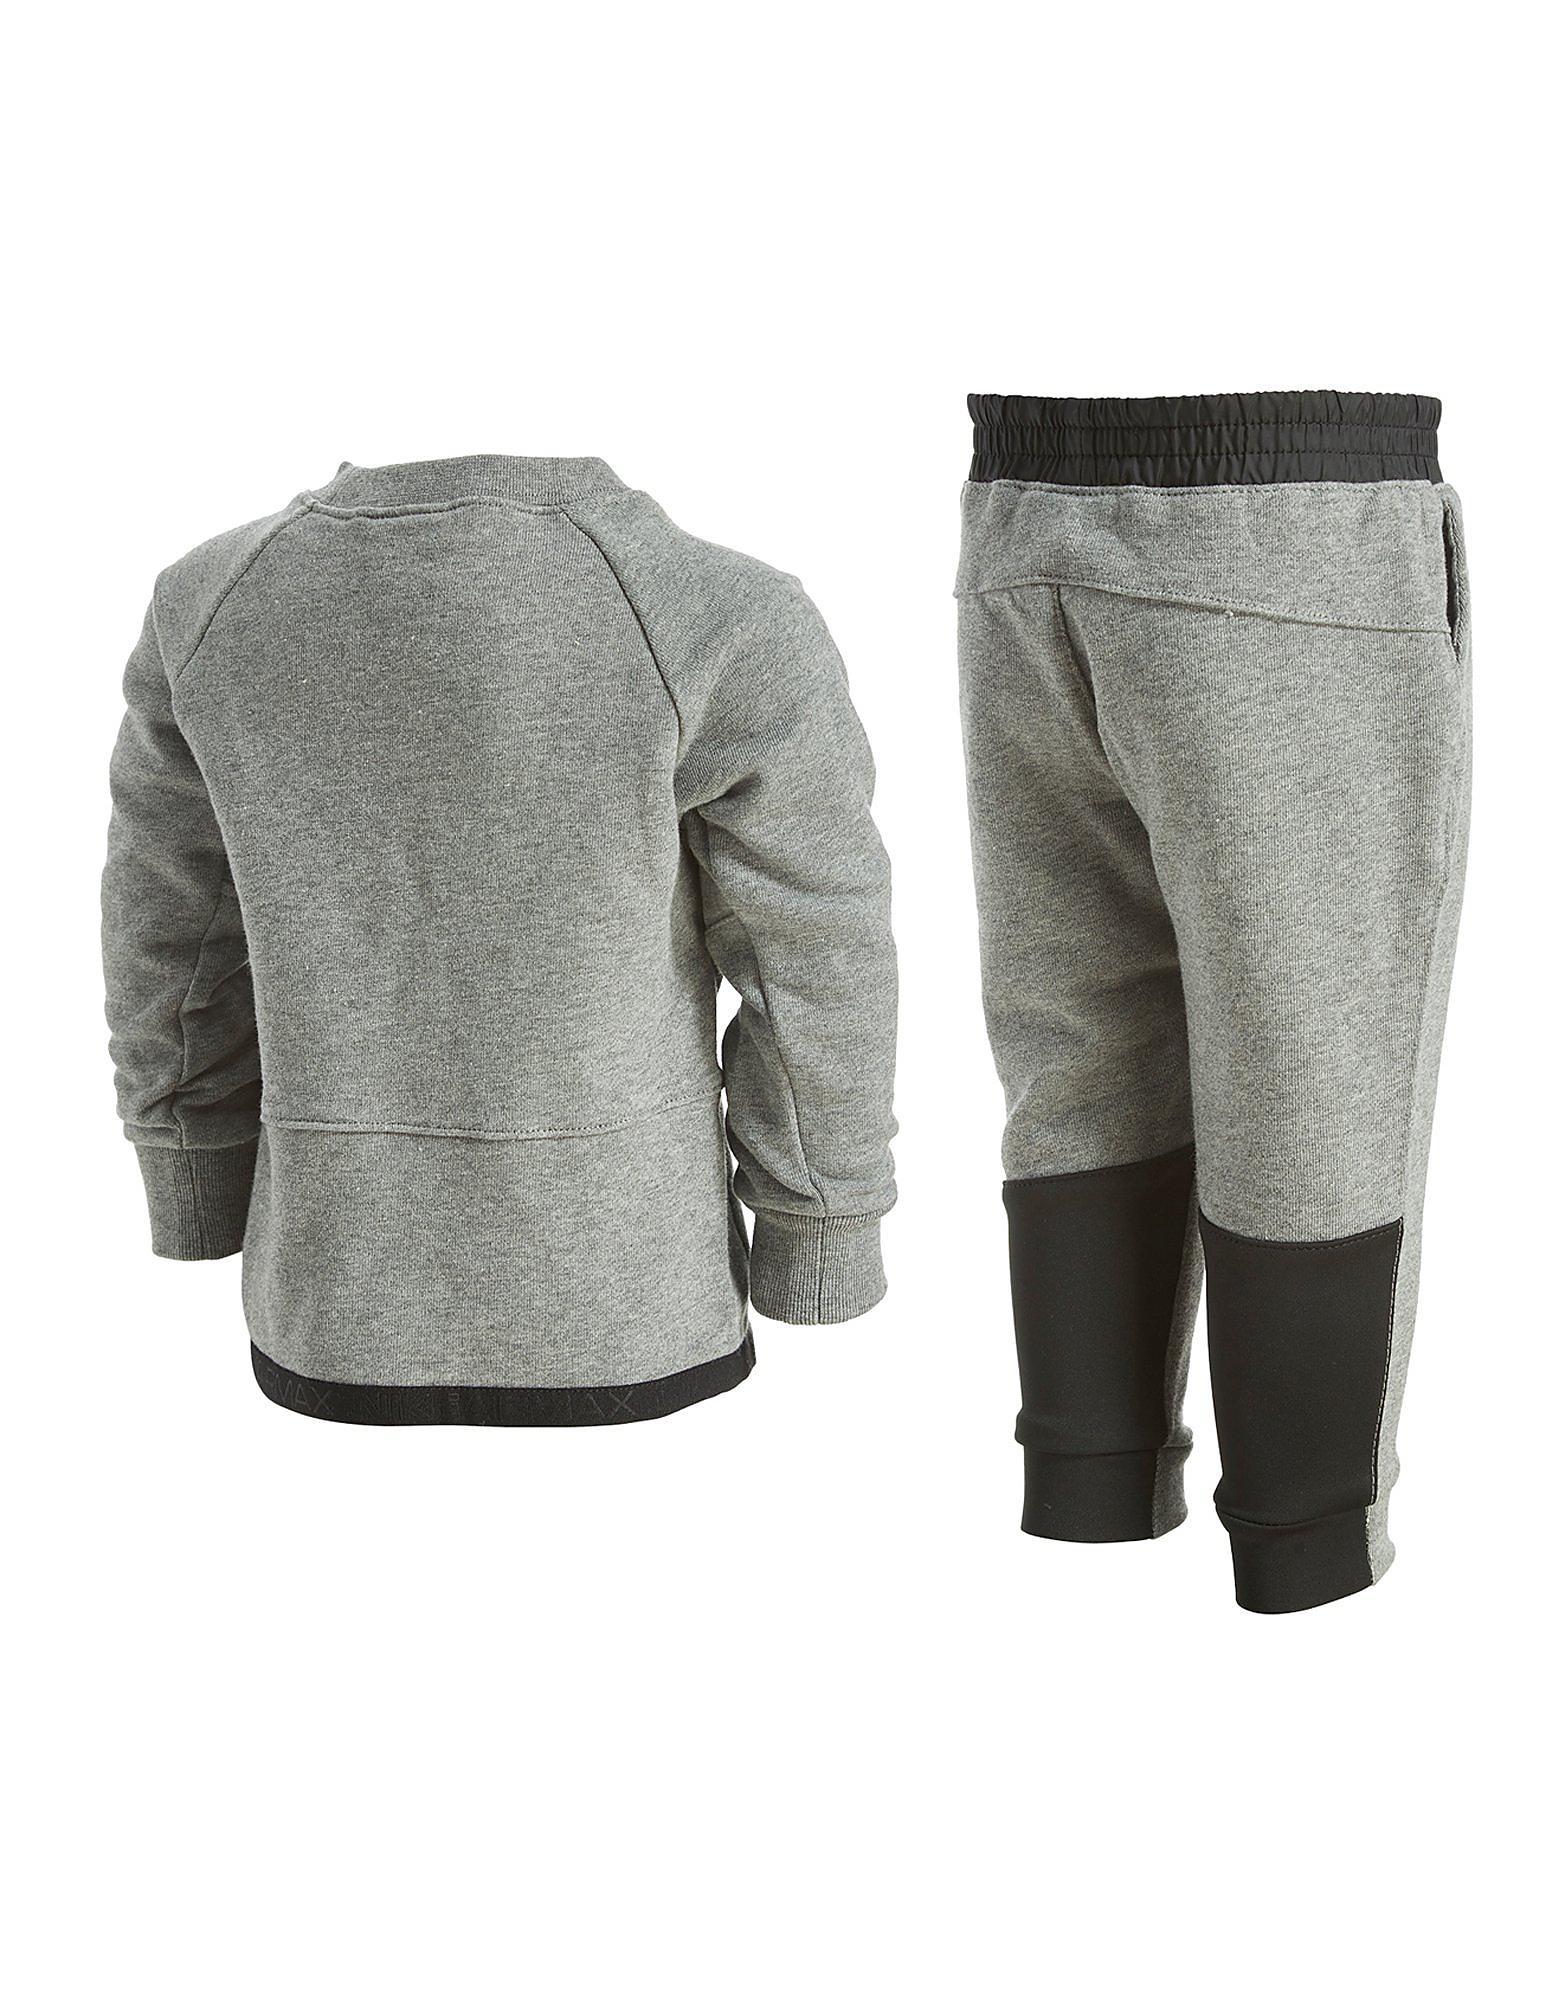 Nike Air Max Crew Suit Baby's